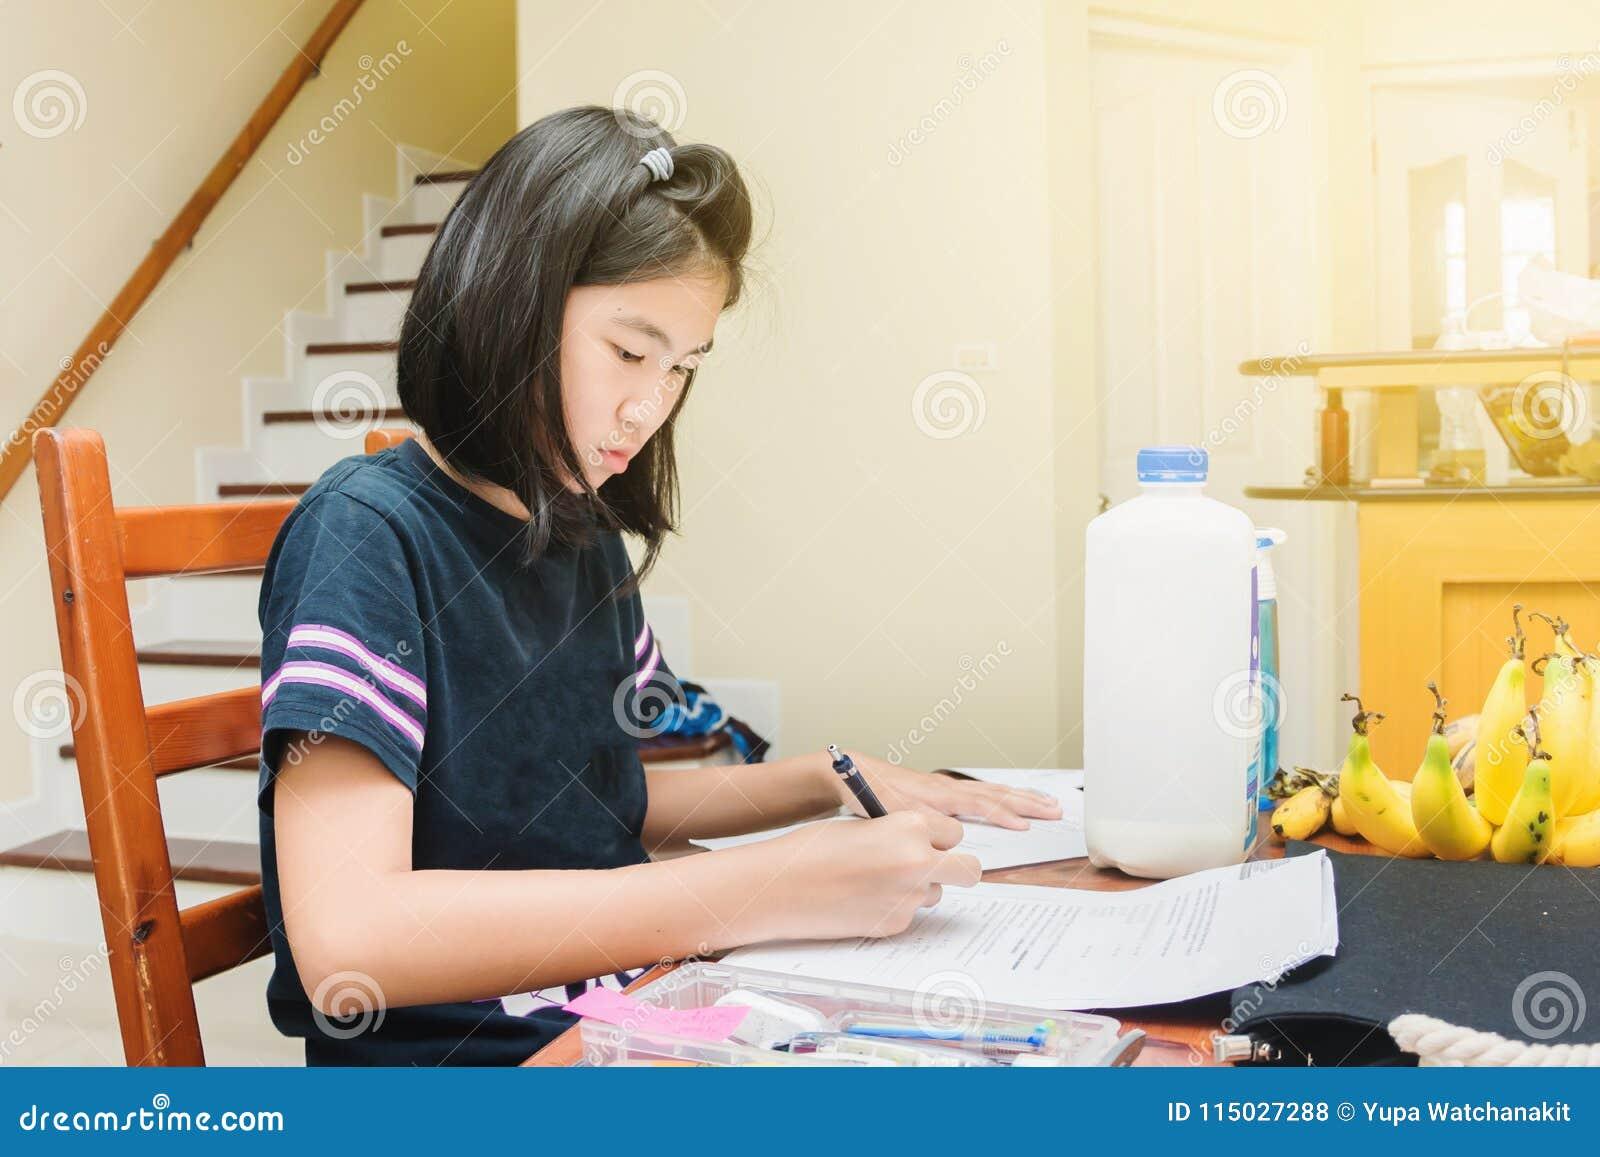 doing homework at home